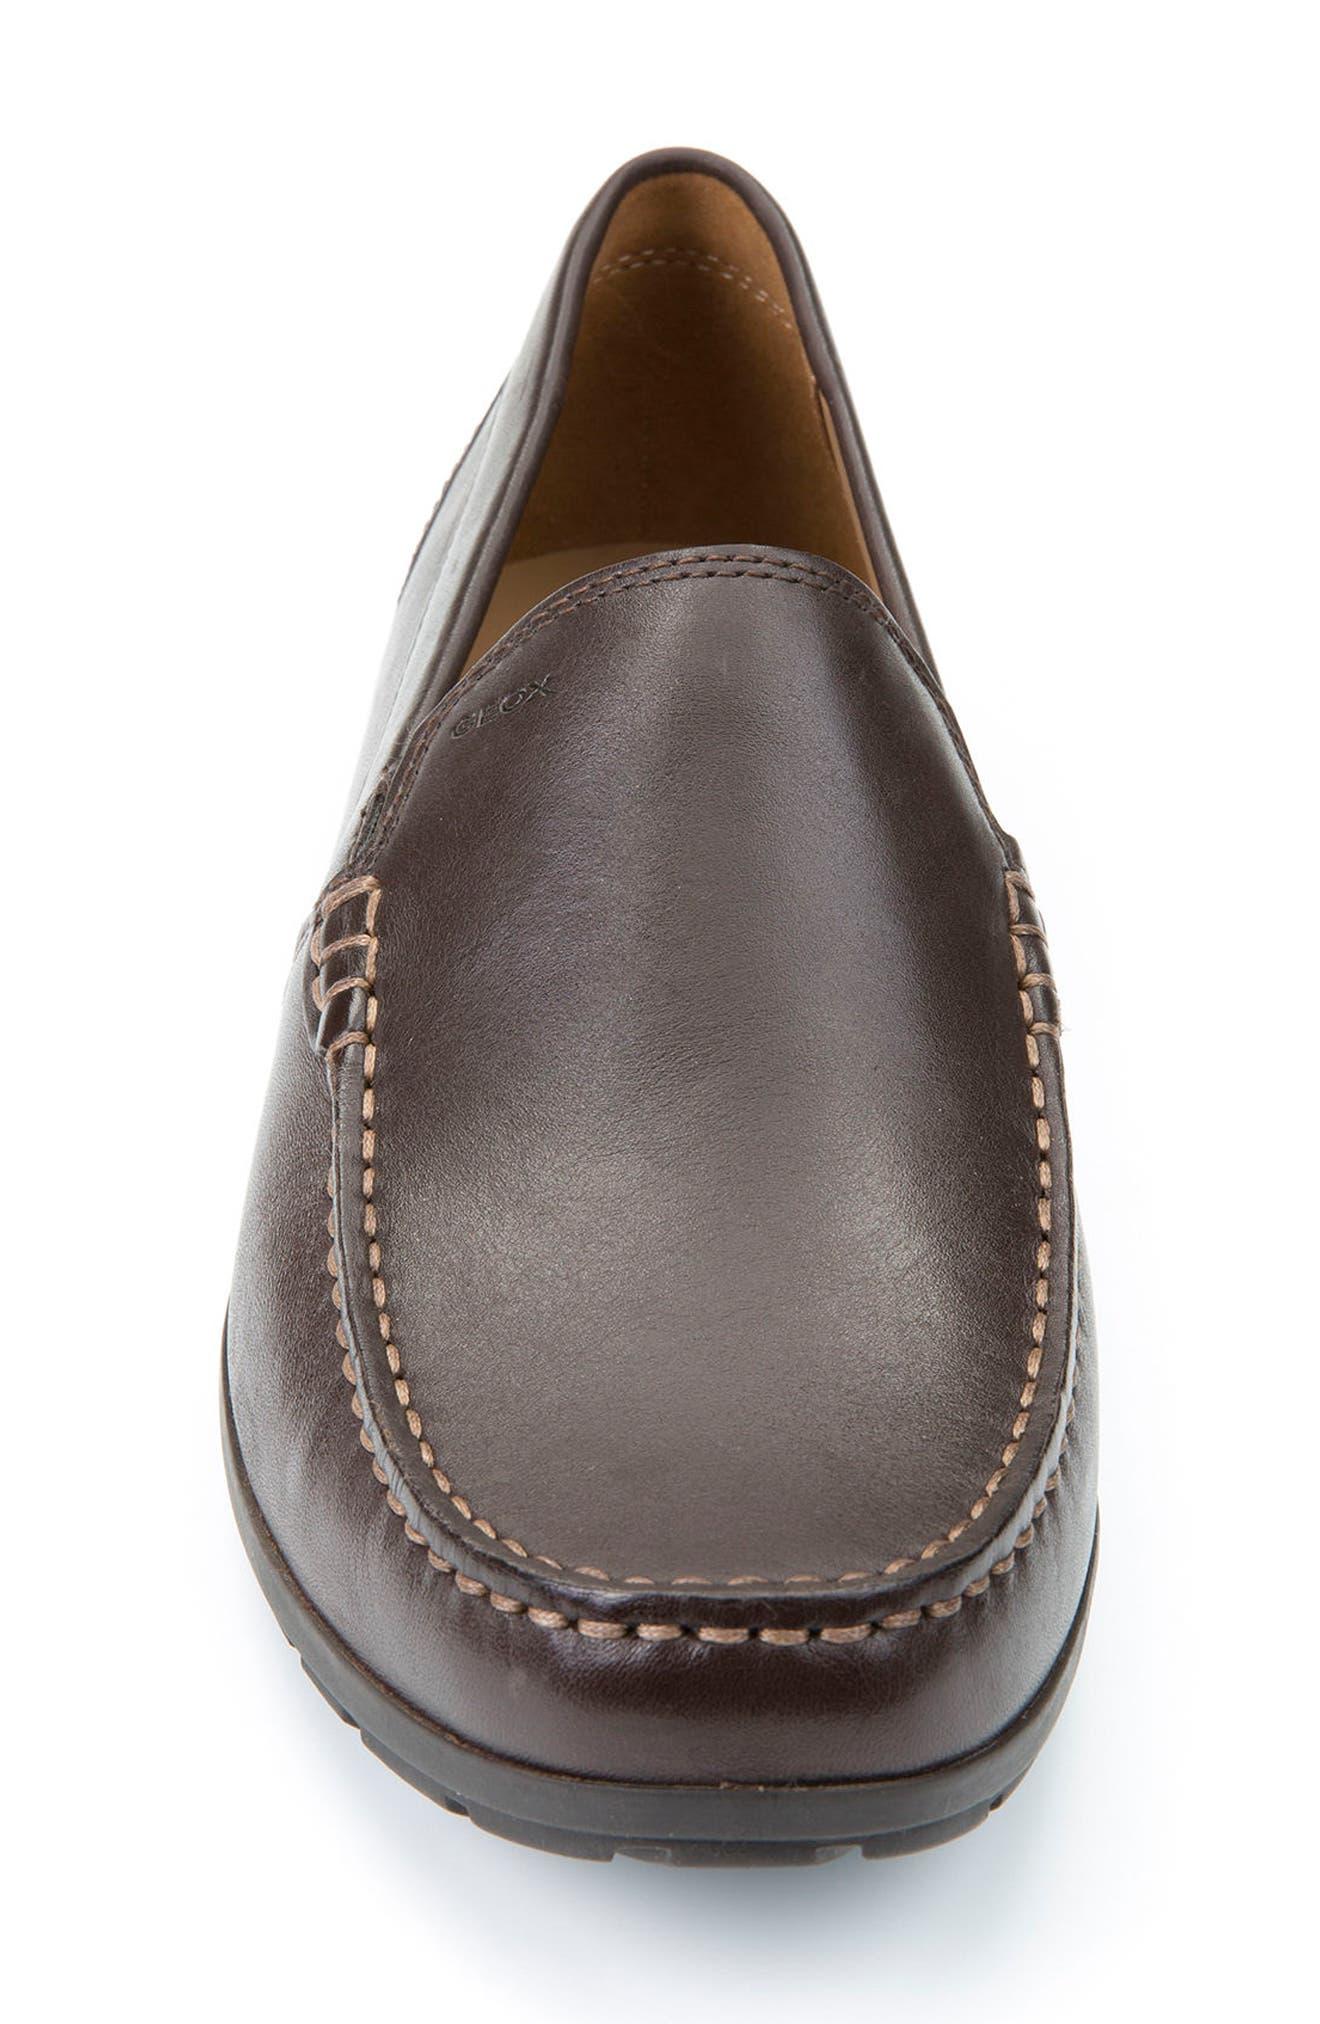 'Simon W2' Venetian Loafer,                             Alternate thumbnail 4, color,                             BROWN LEATHER